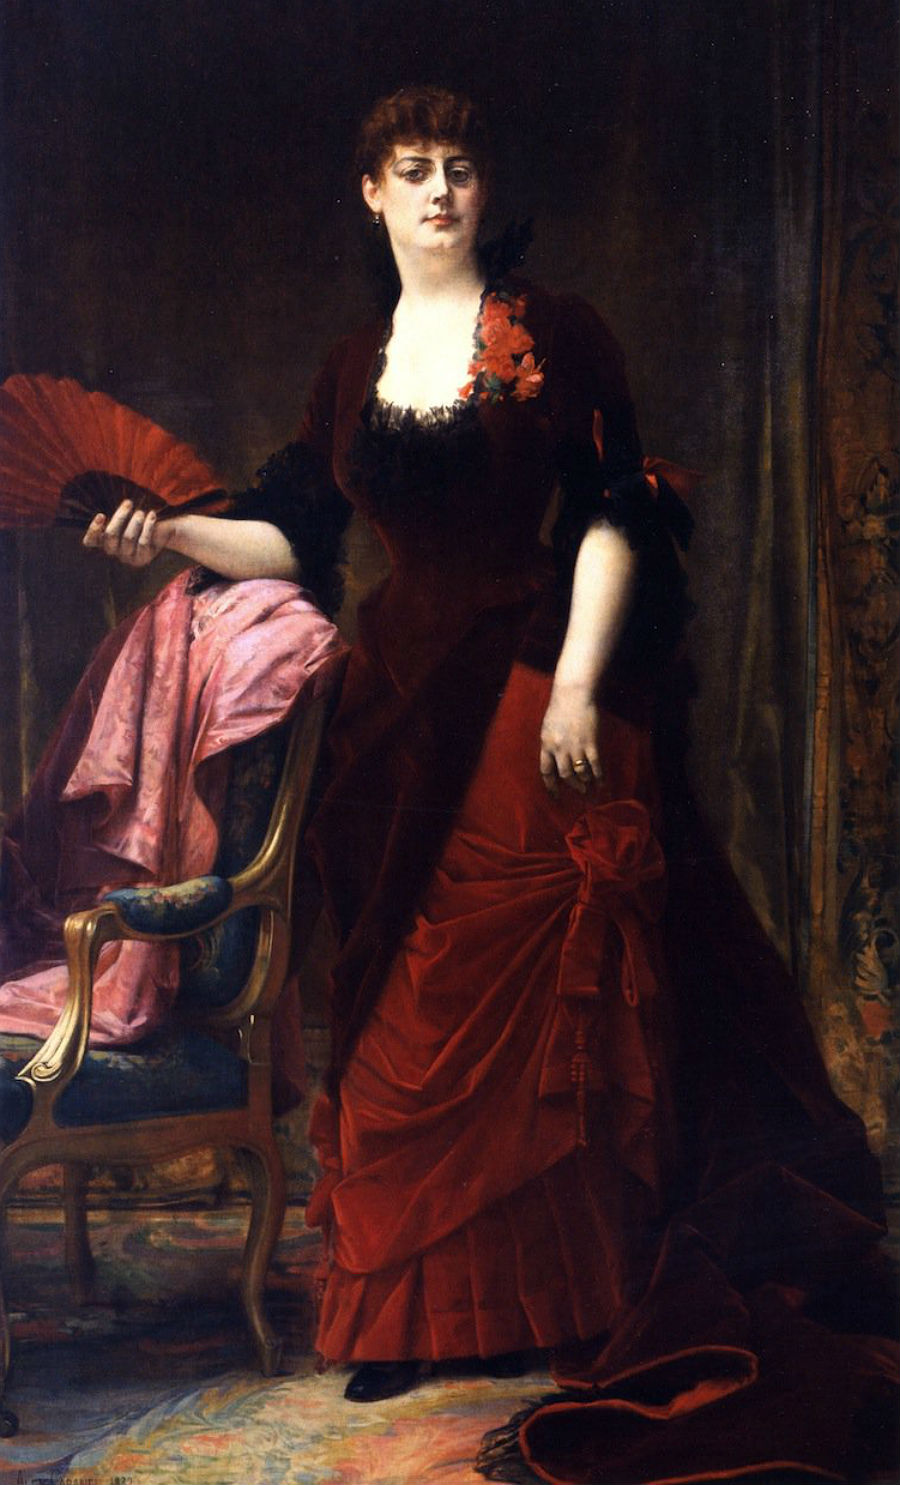 Mrs-Collis-Potter-Huntington-Alexandre-Cabanel-oil-painting-1.jpg